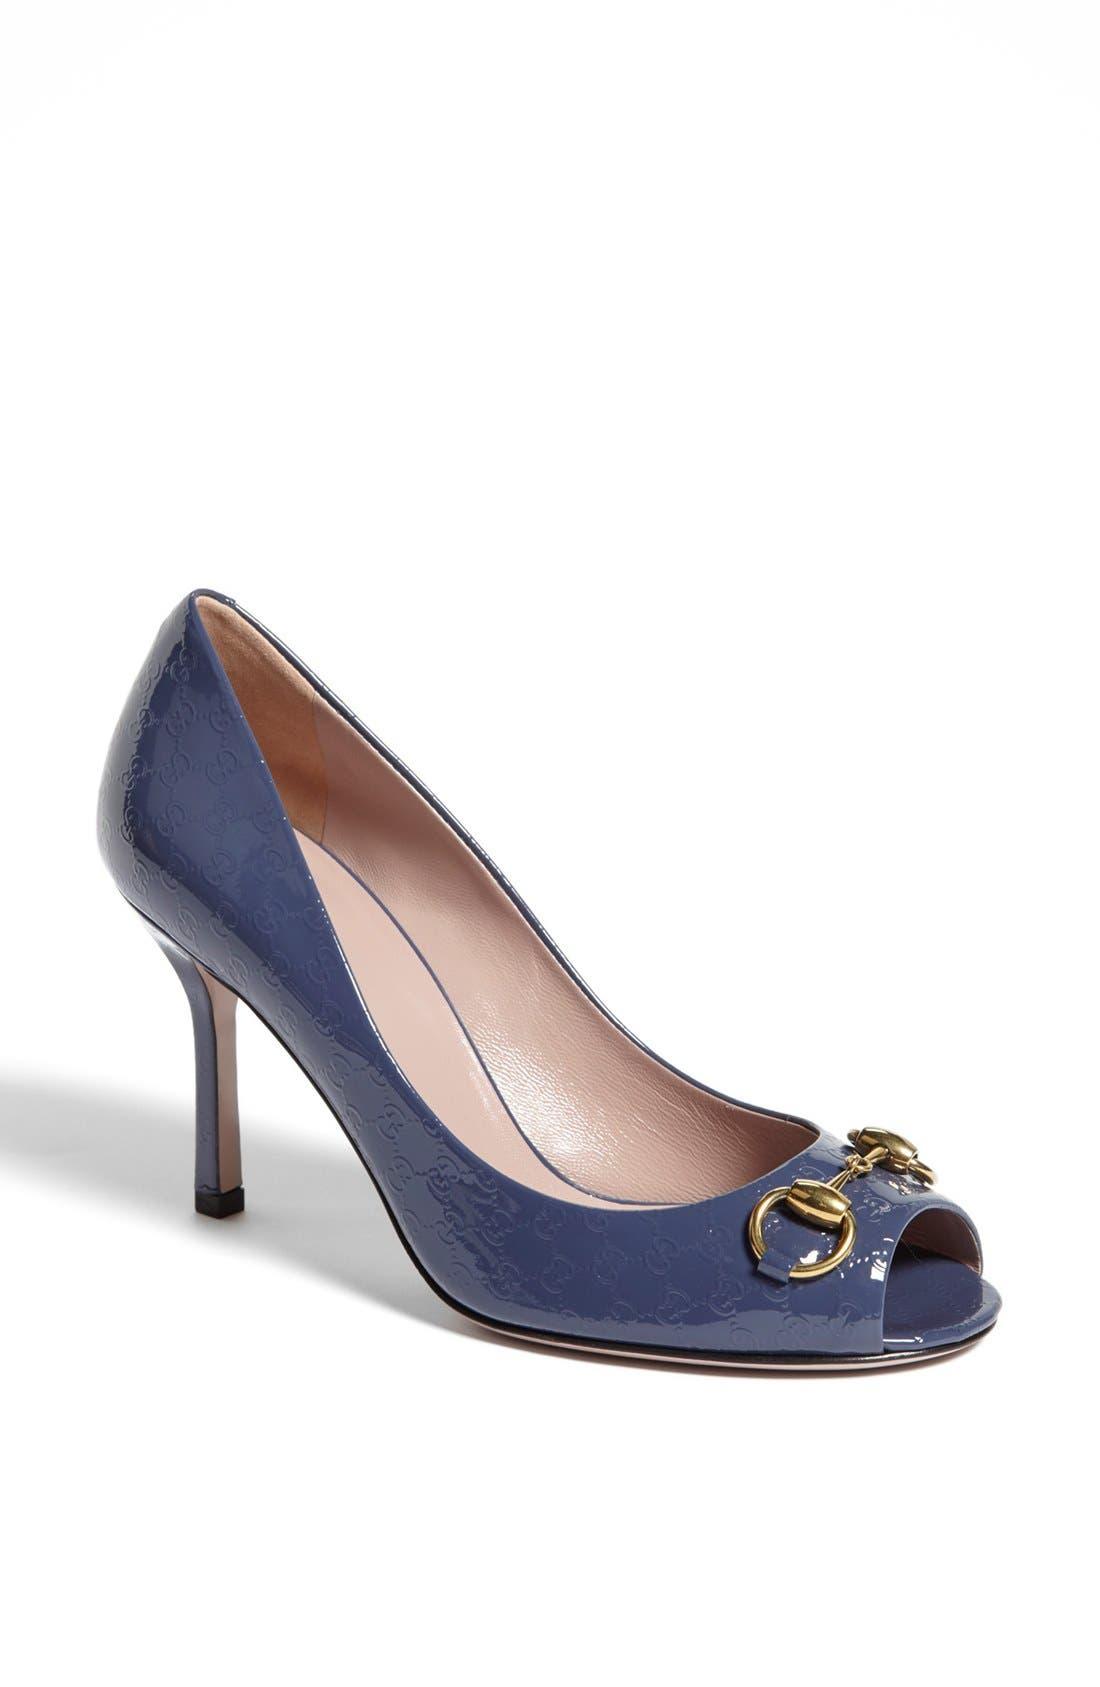 Main Image - Gucci 'Jolene' Peep Toe Pump